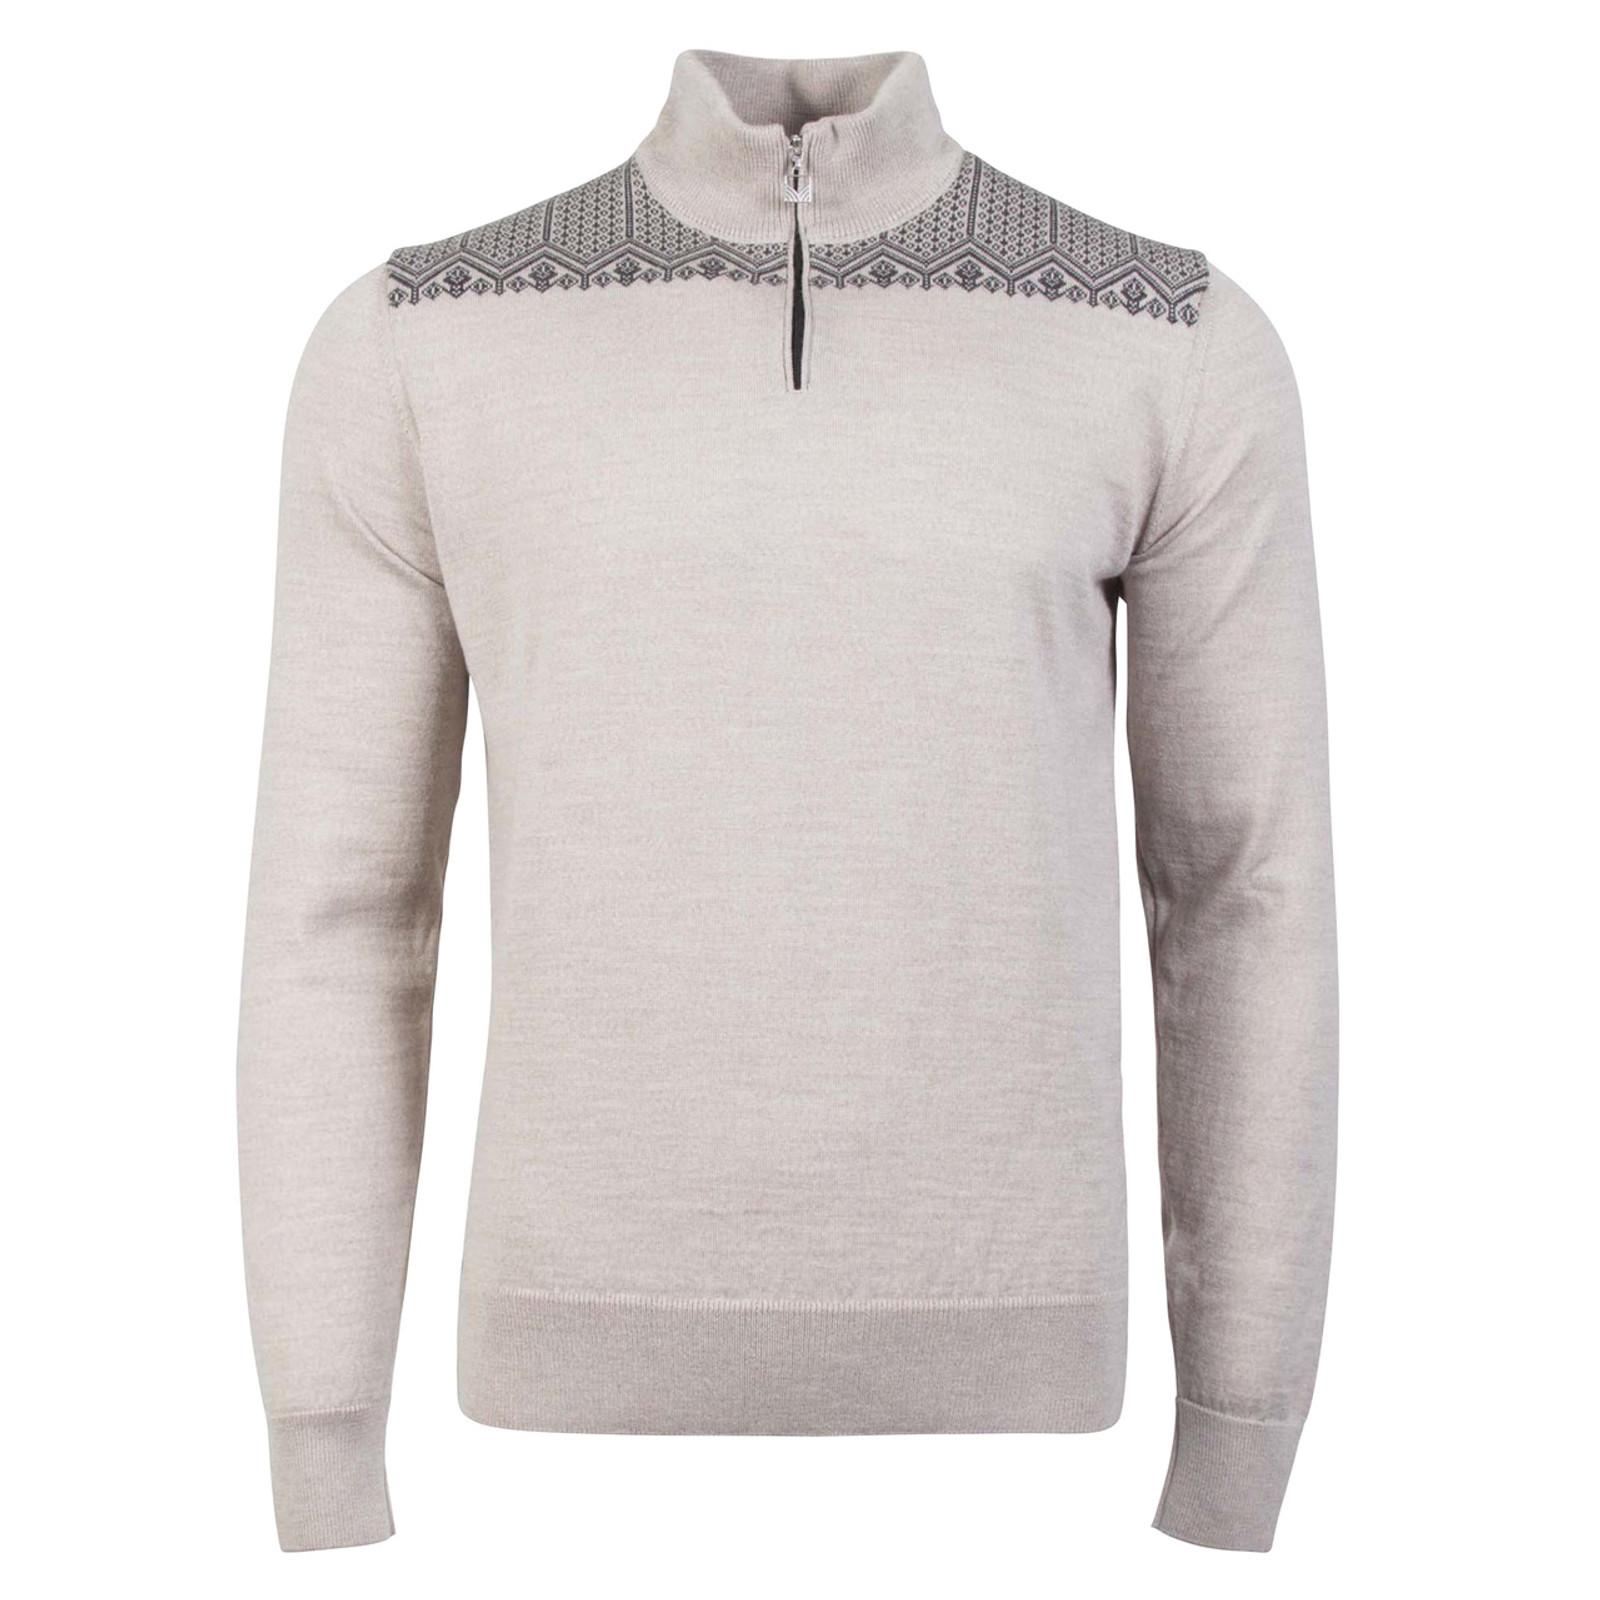 Dale of Norway, Anniversary sweater, unisex, in Sand Mel/Dark Grey Mel, 93851-P